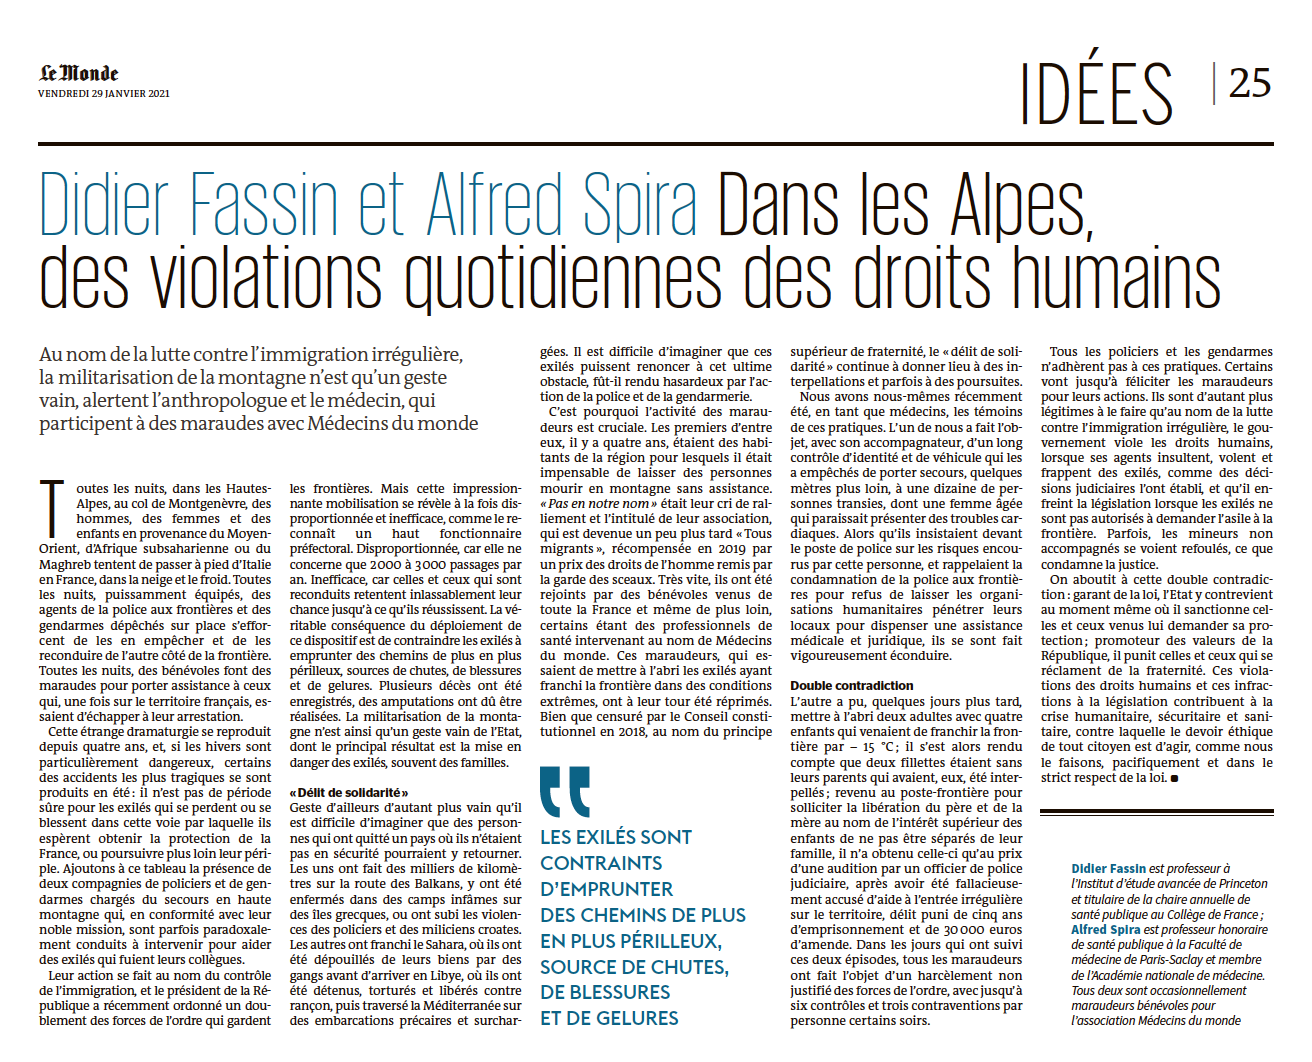 Tribubne Didier Fassin et Alfred Spire / Le Monde 29 janvier 2021